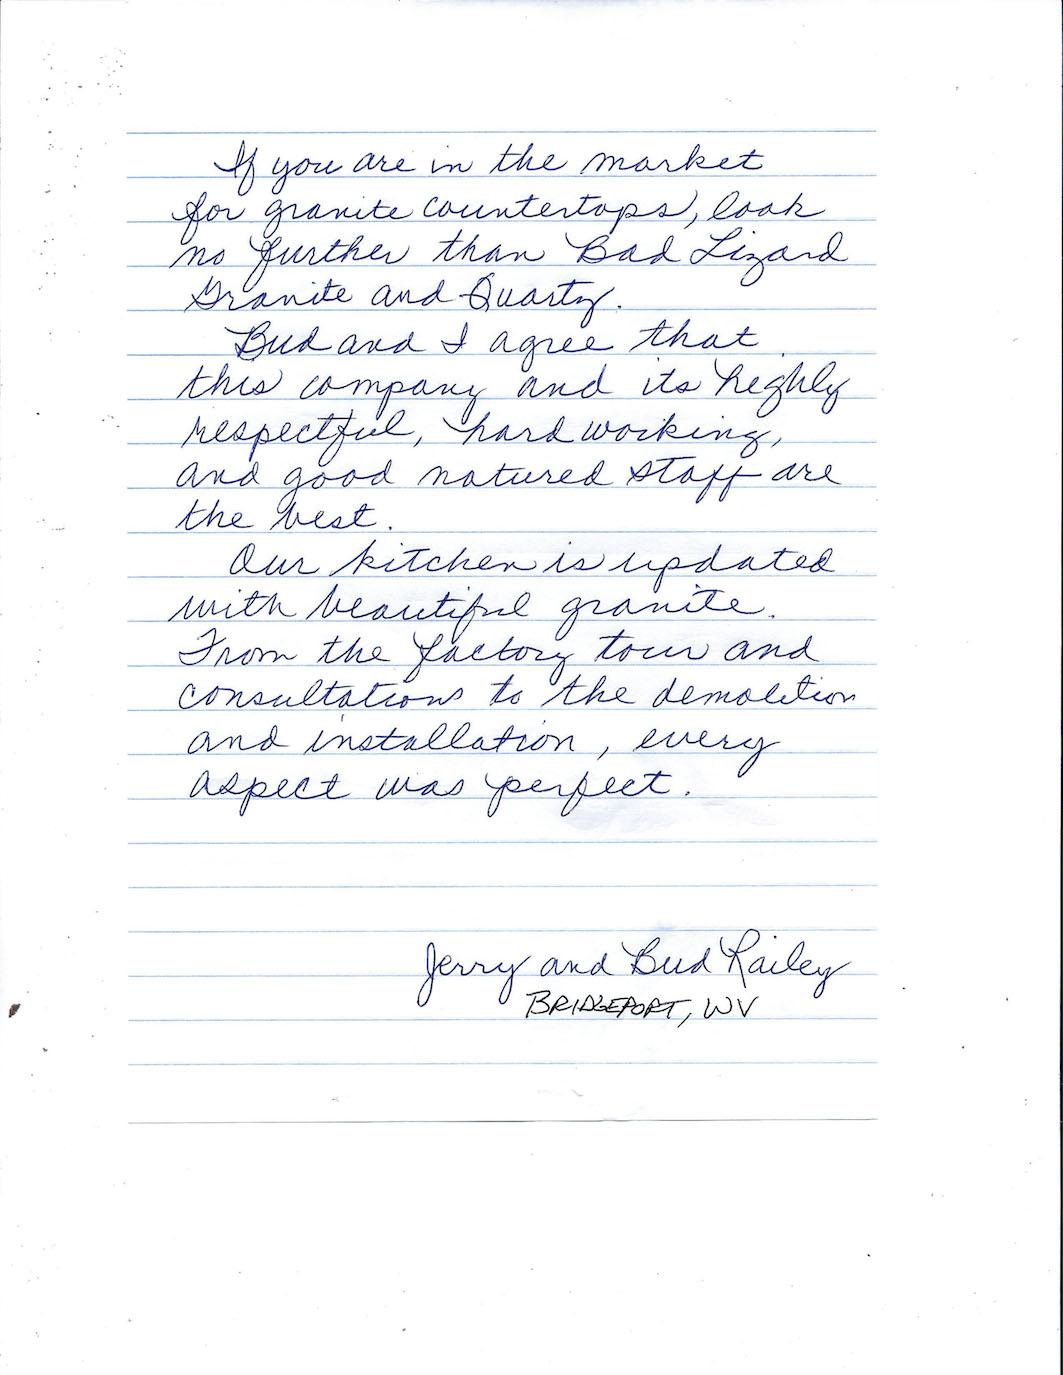 Railey Testimonial.JPG